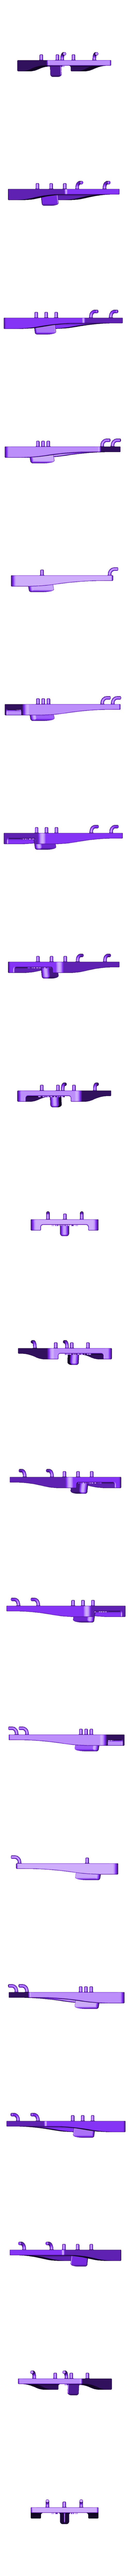 enforce_53_pins.stl Download free STL file Tool Holder for Wrecking Bar Large (530mm) 037 I ENFORCE I for screws or peg board • 3D printing object, Wiesemann1893